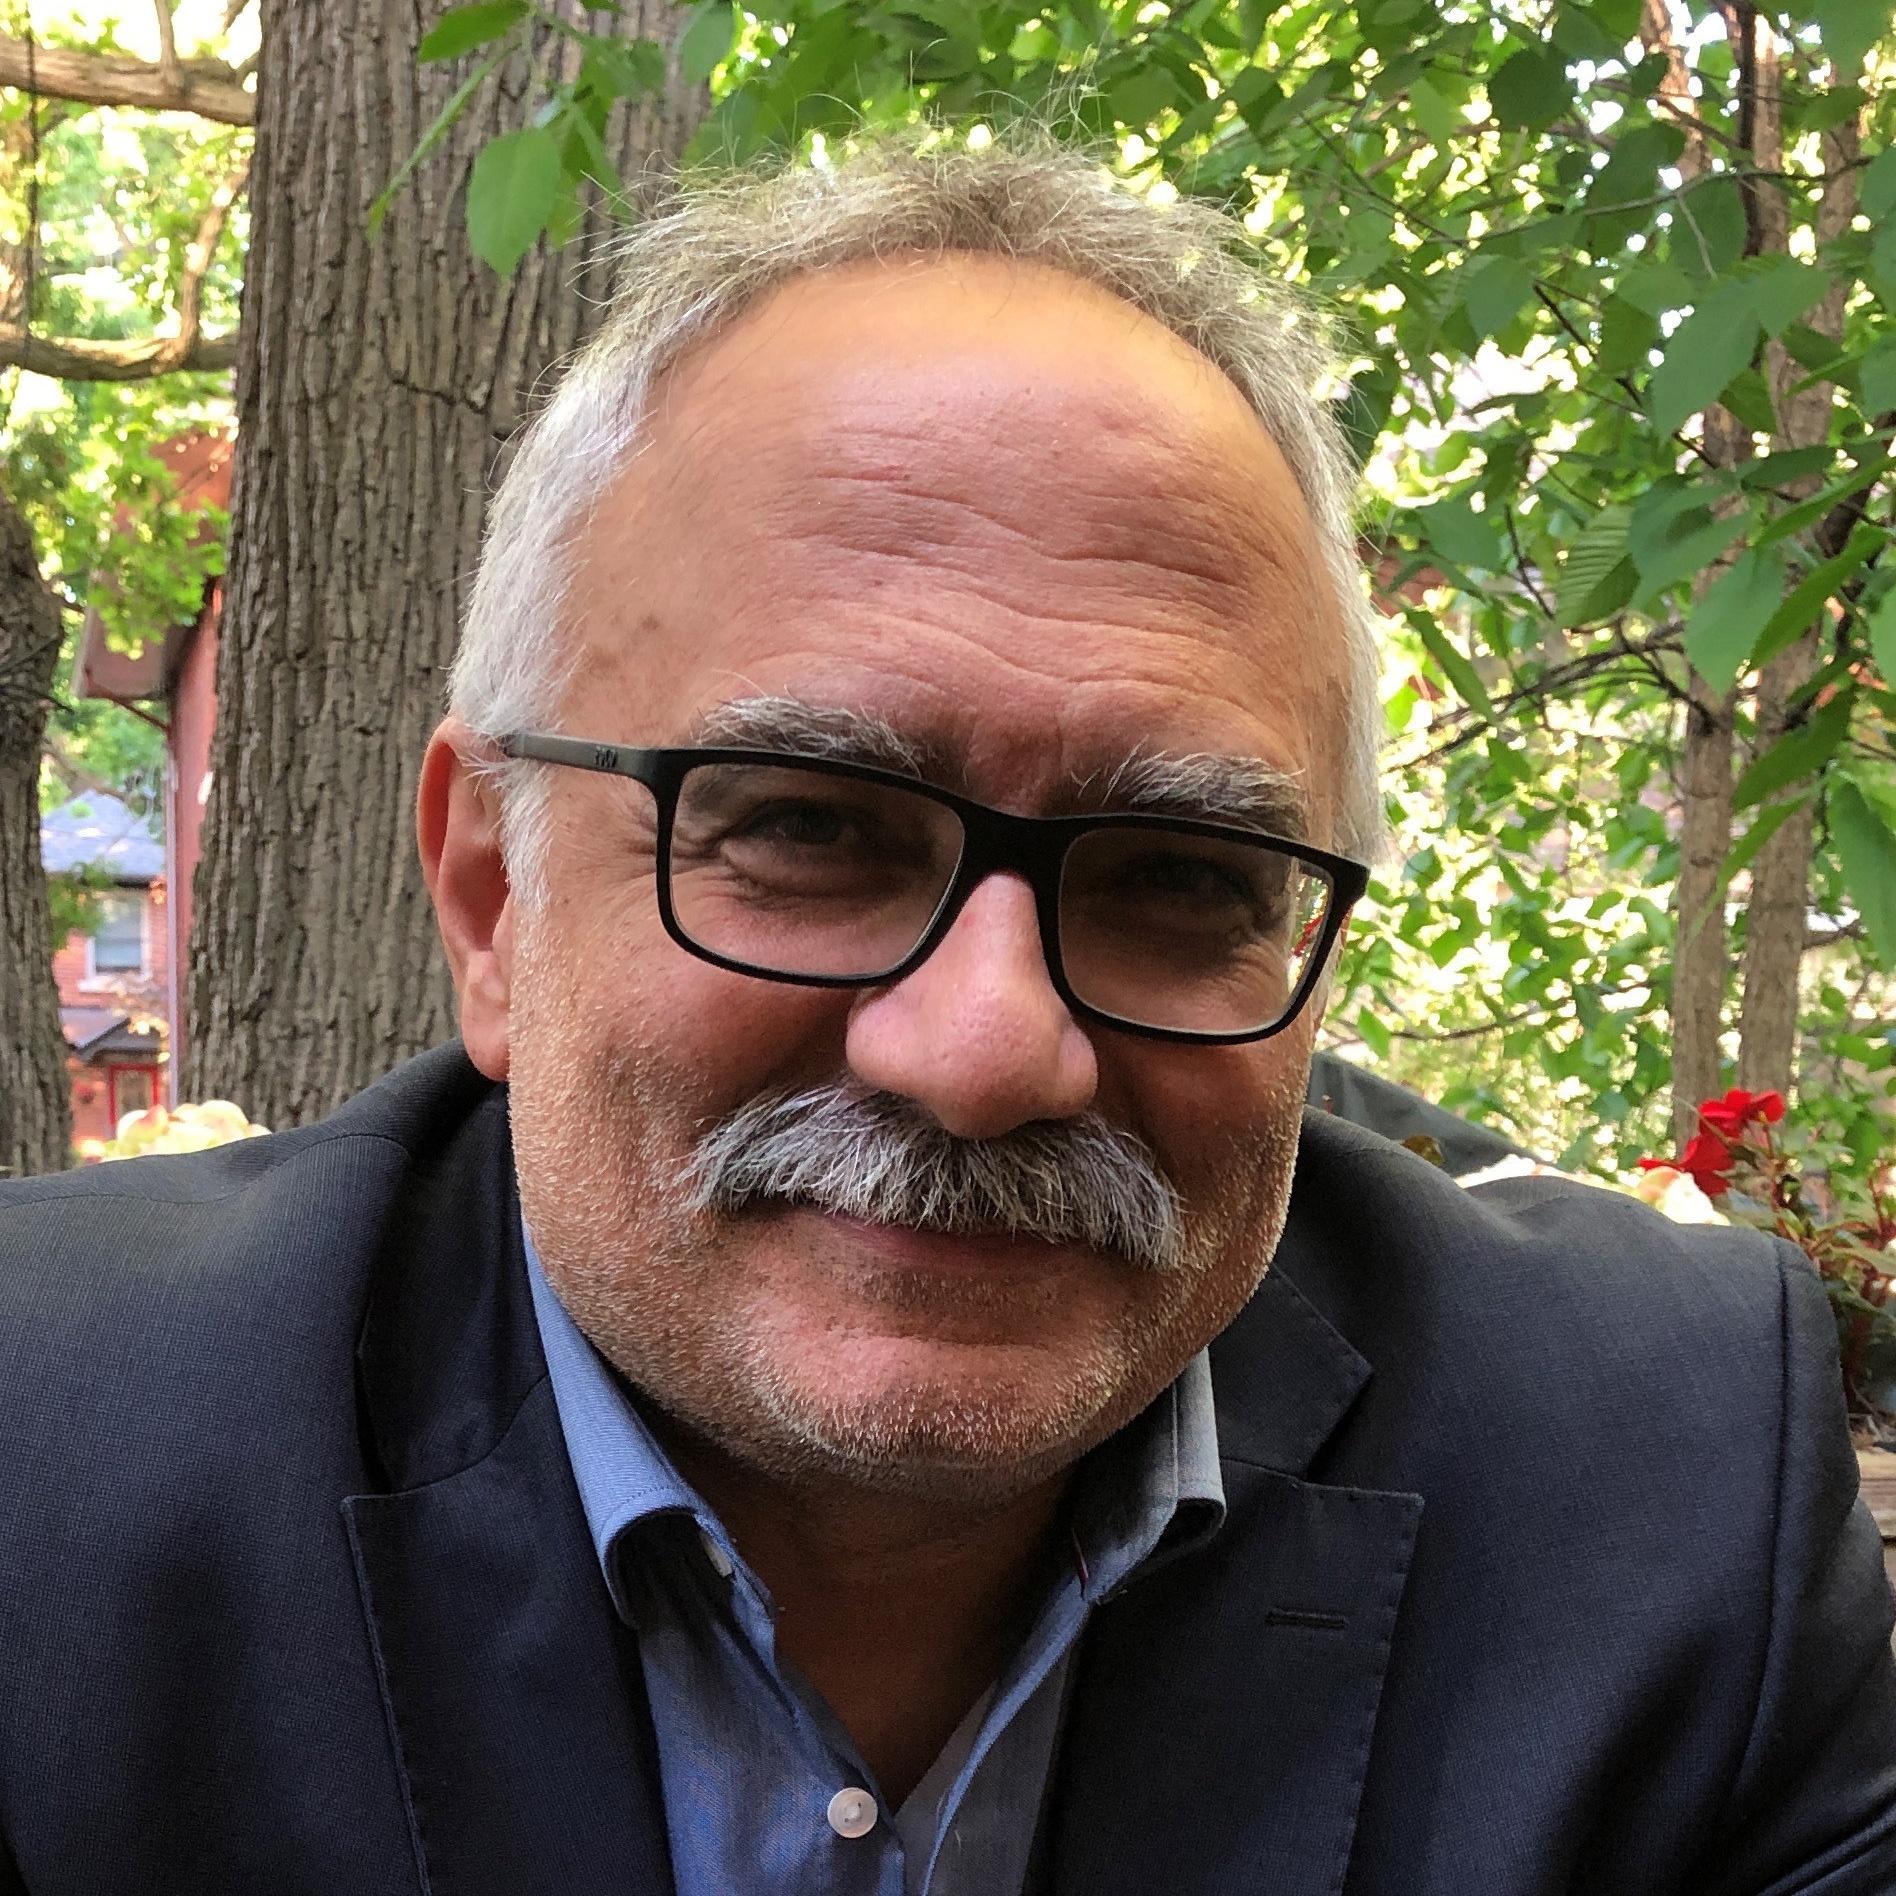 Ümit Mustafa Kiziltan